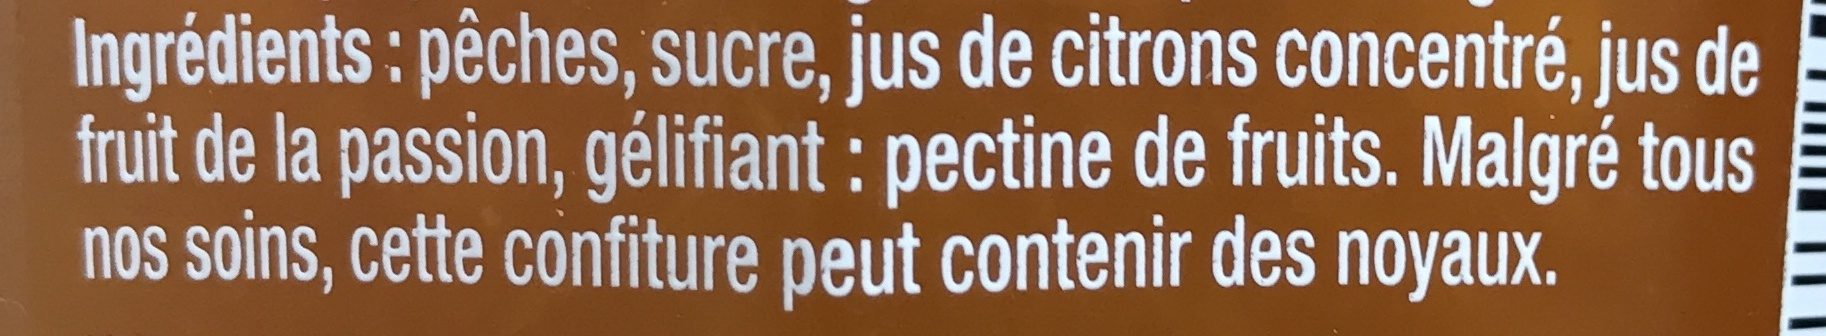 Confiture pêche intense - Ingrediënten - fr